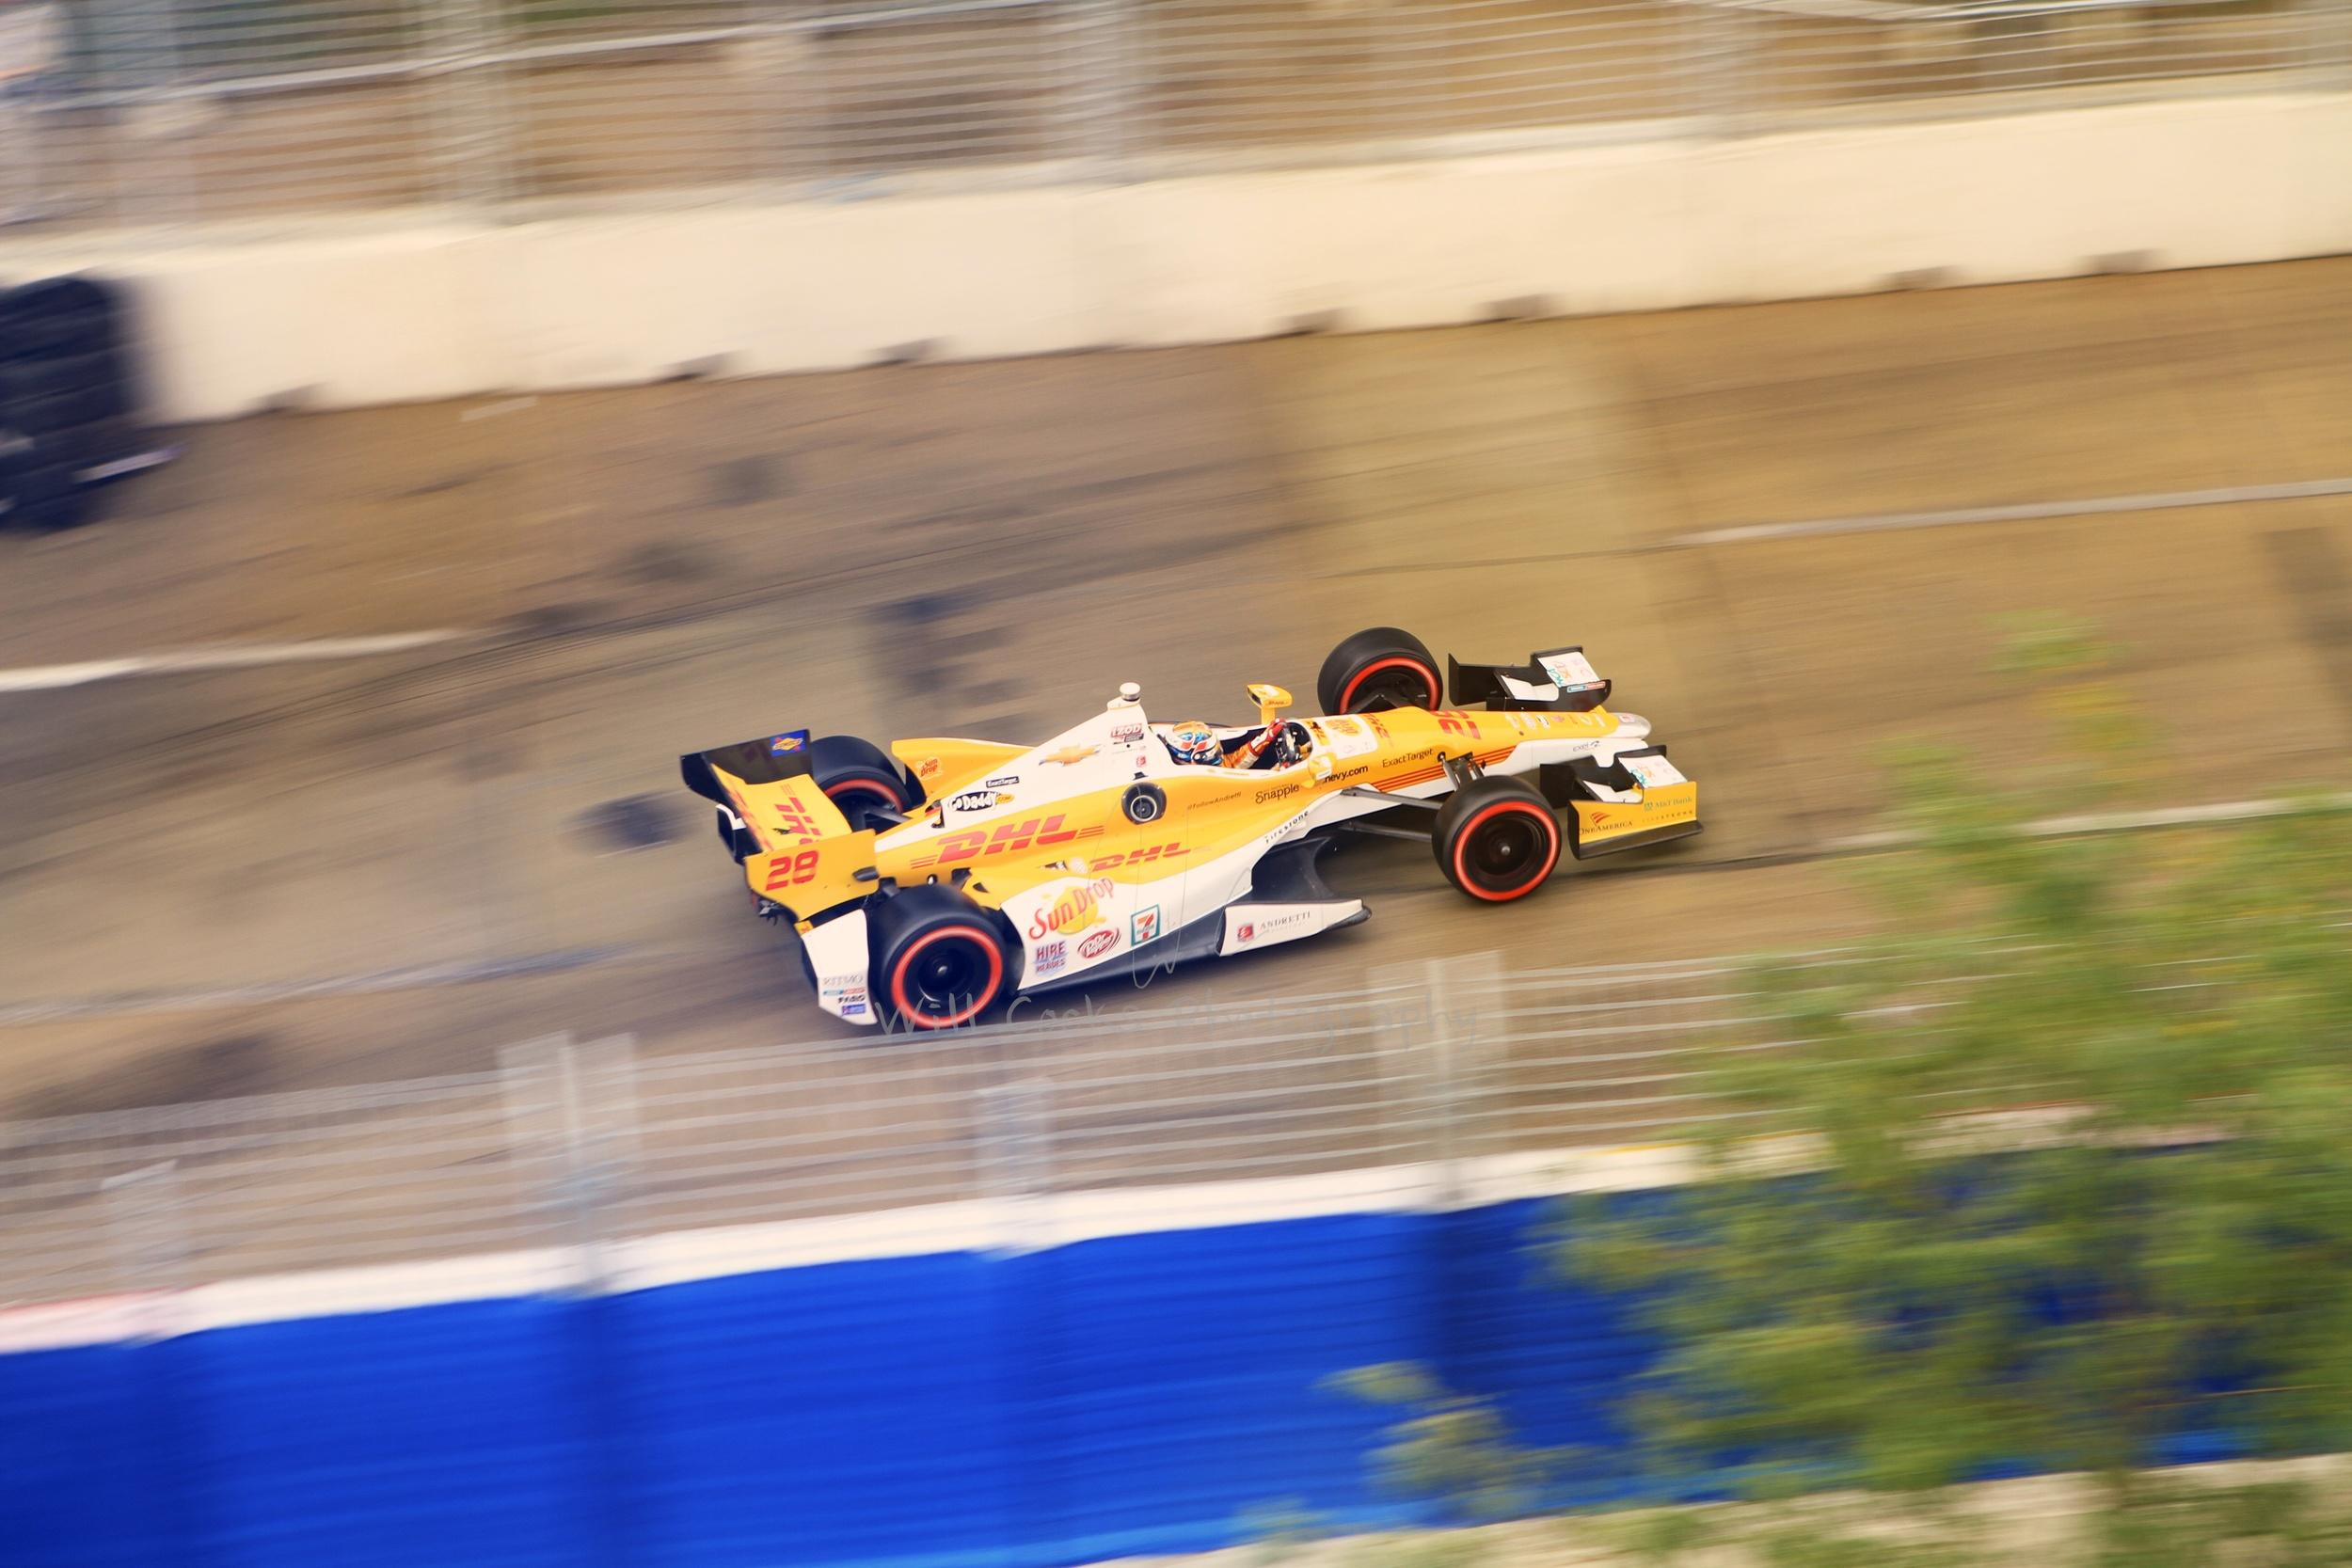 Ryan Hunter-Reay speeds down Pratt St after Turn 12 in Baltimore, MD